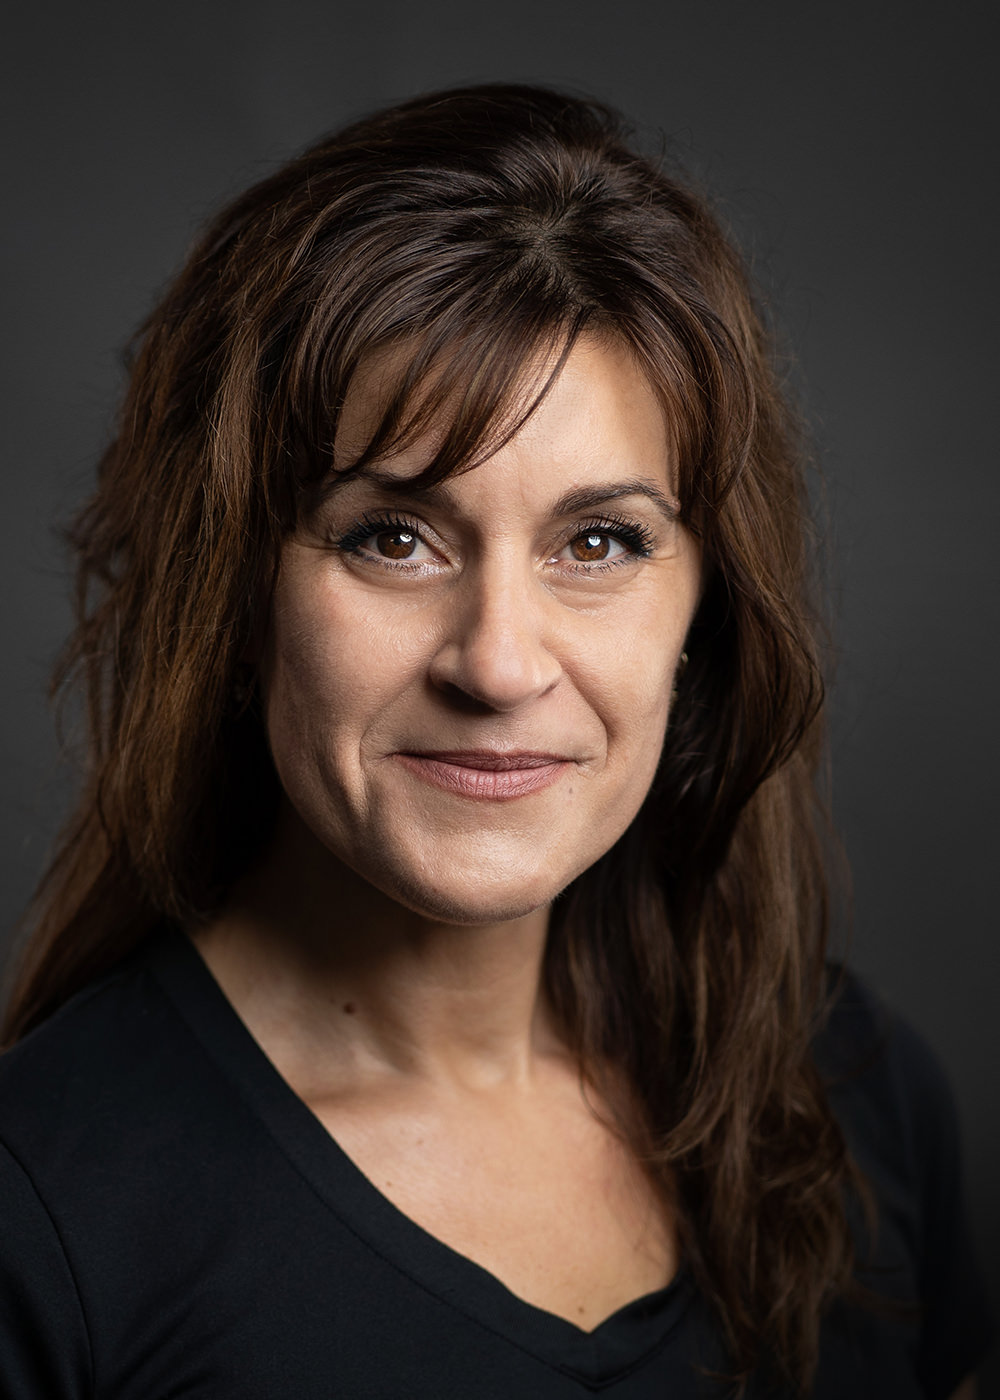 Sonia Manolova